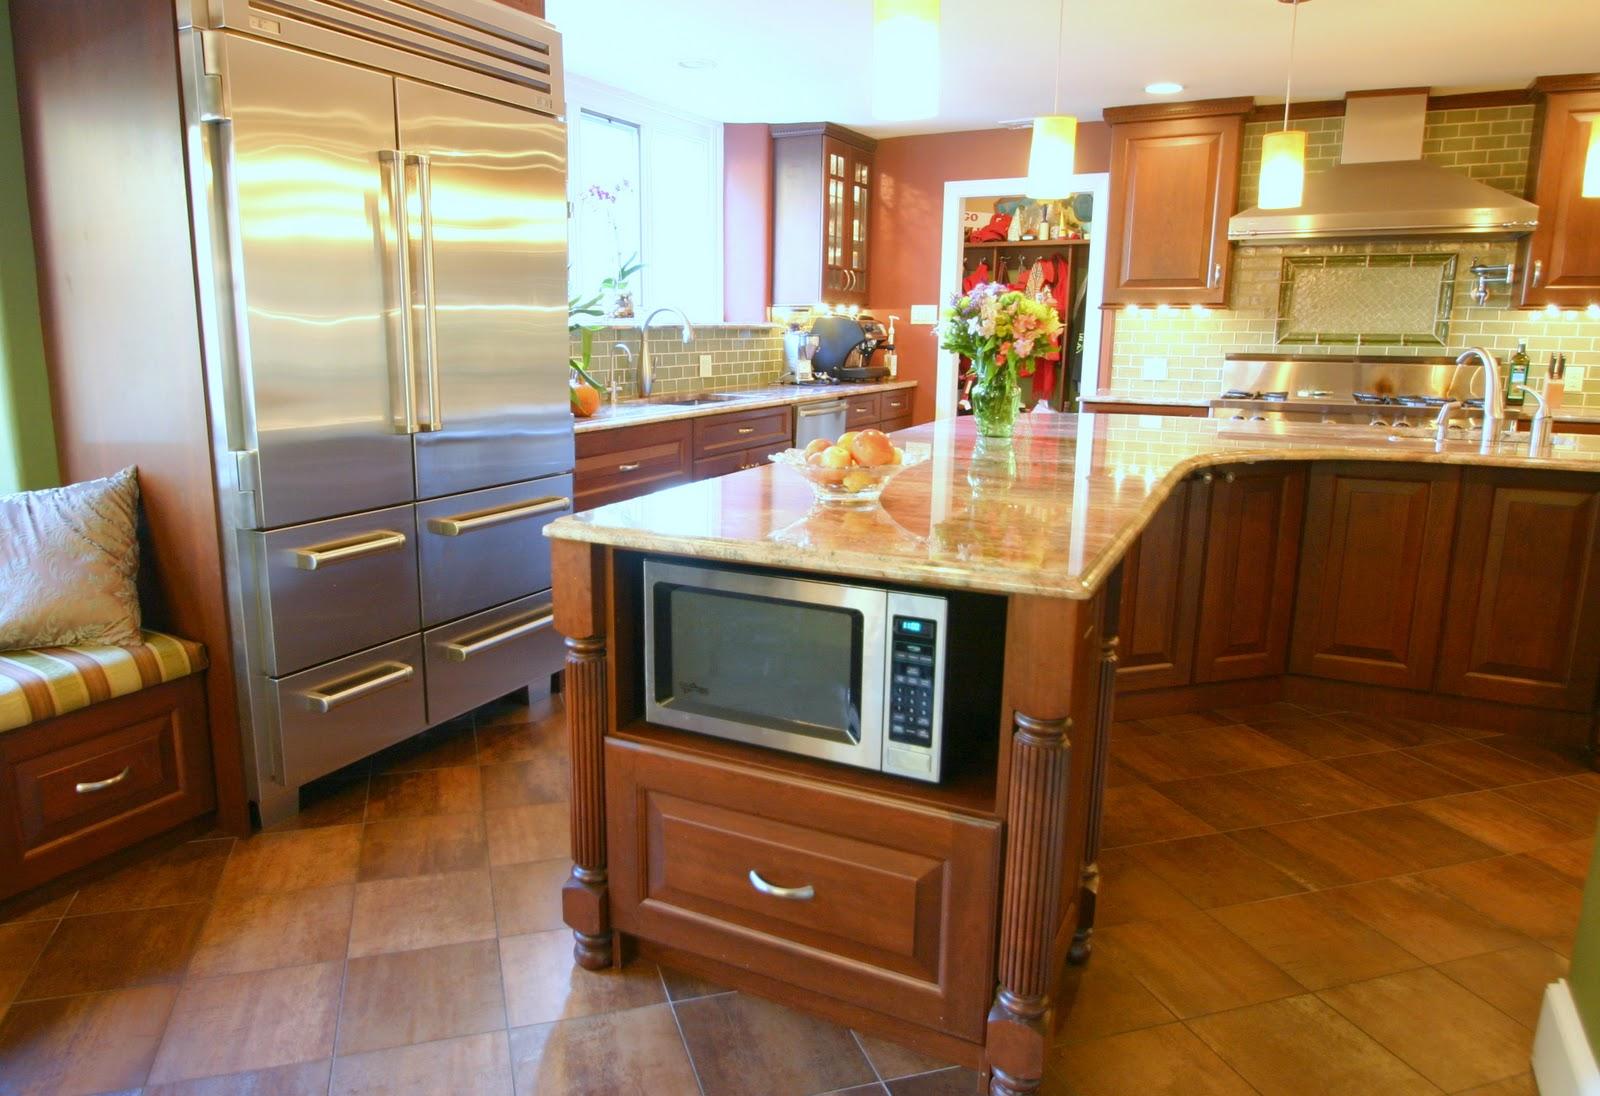 an extra unused room is added on to a kitchen design manifestdesign manifest. Black Bedroom Furniture Sets. Home Design Ideas